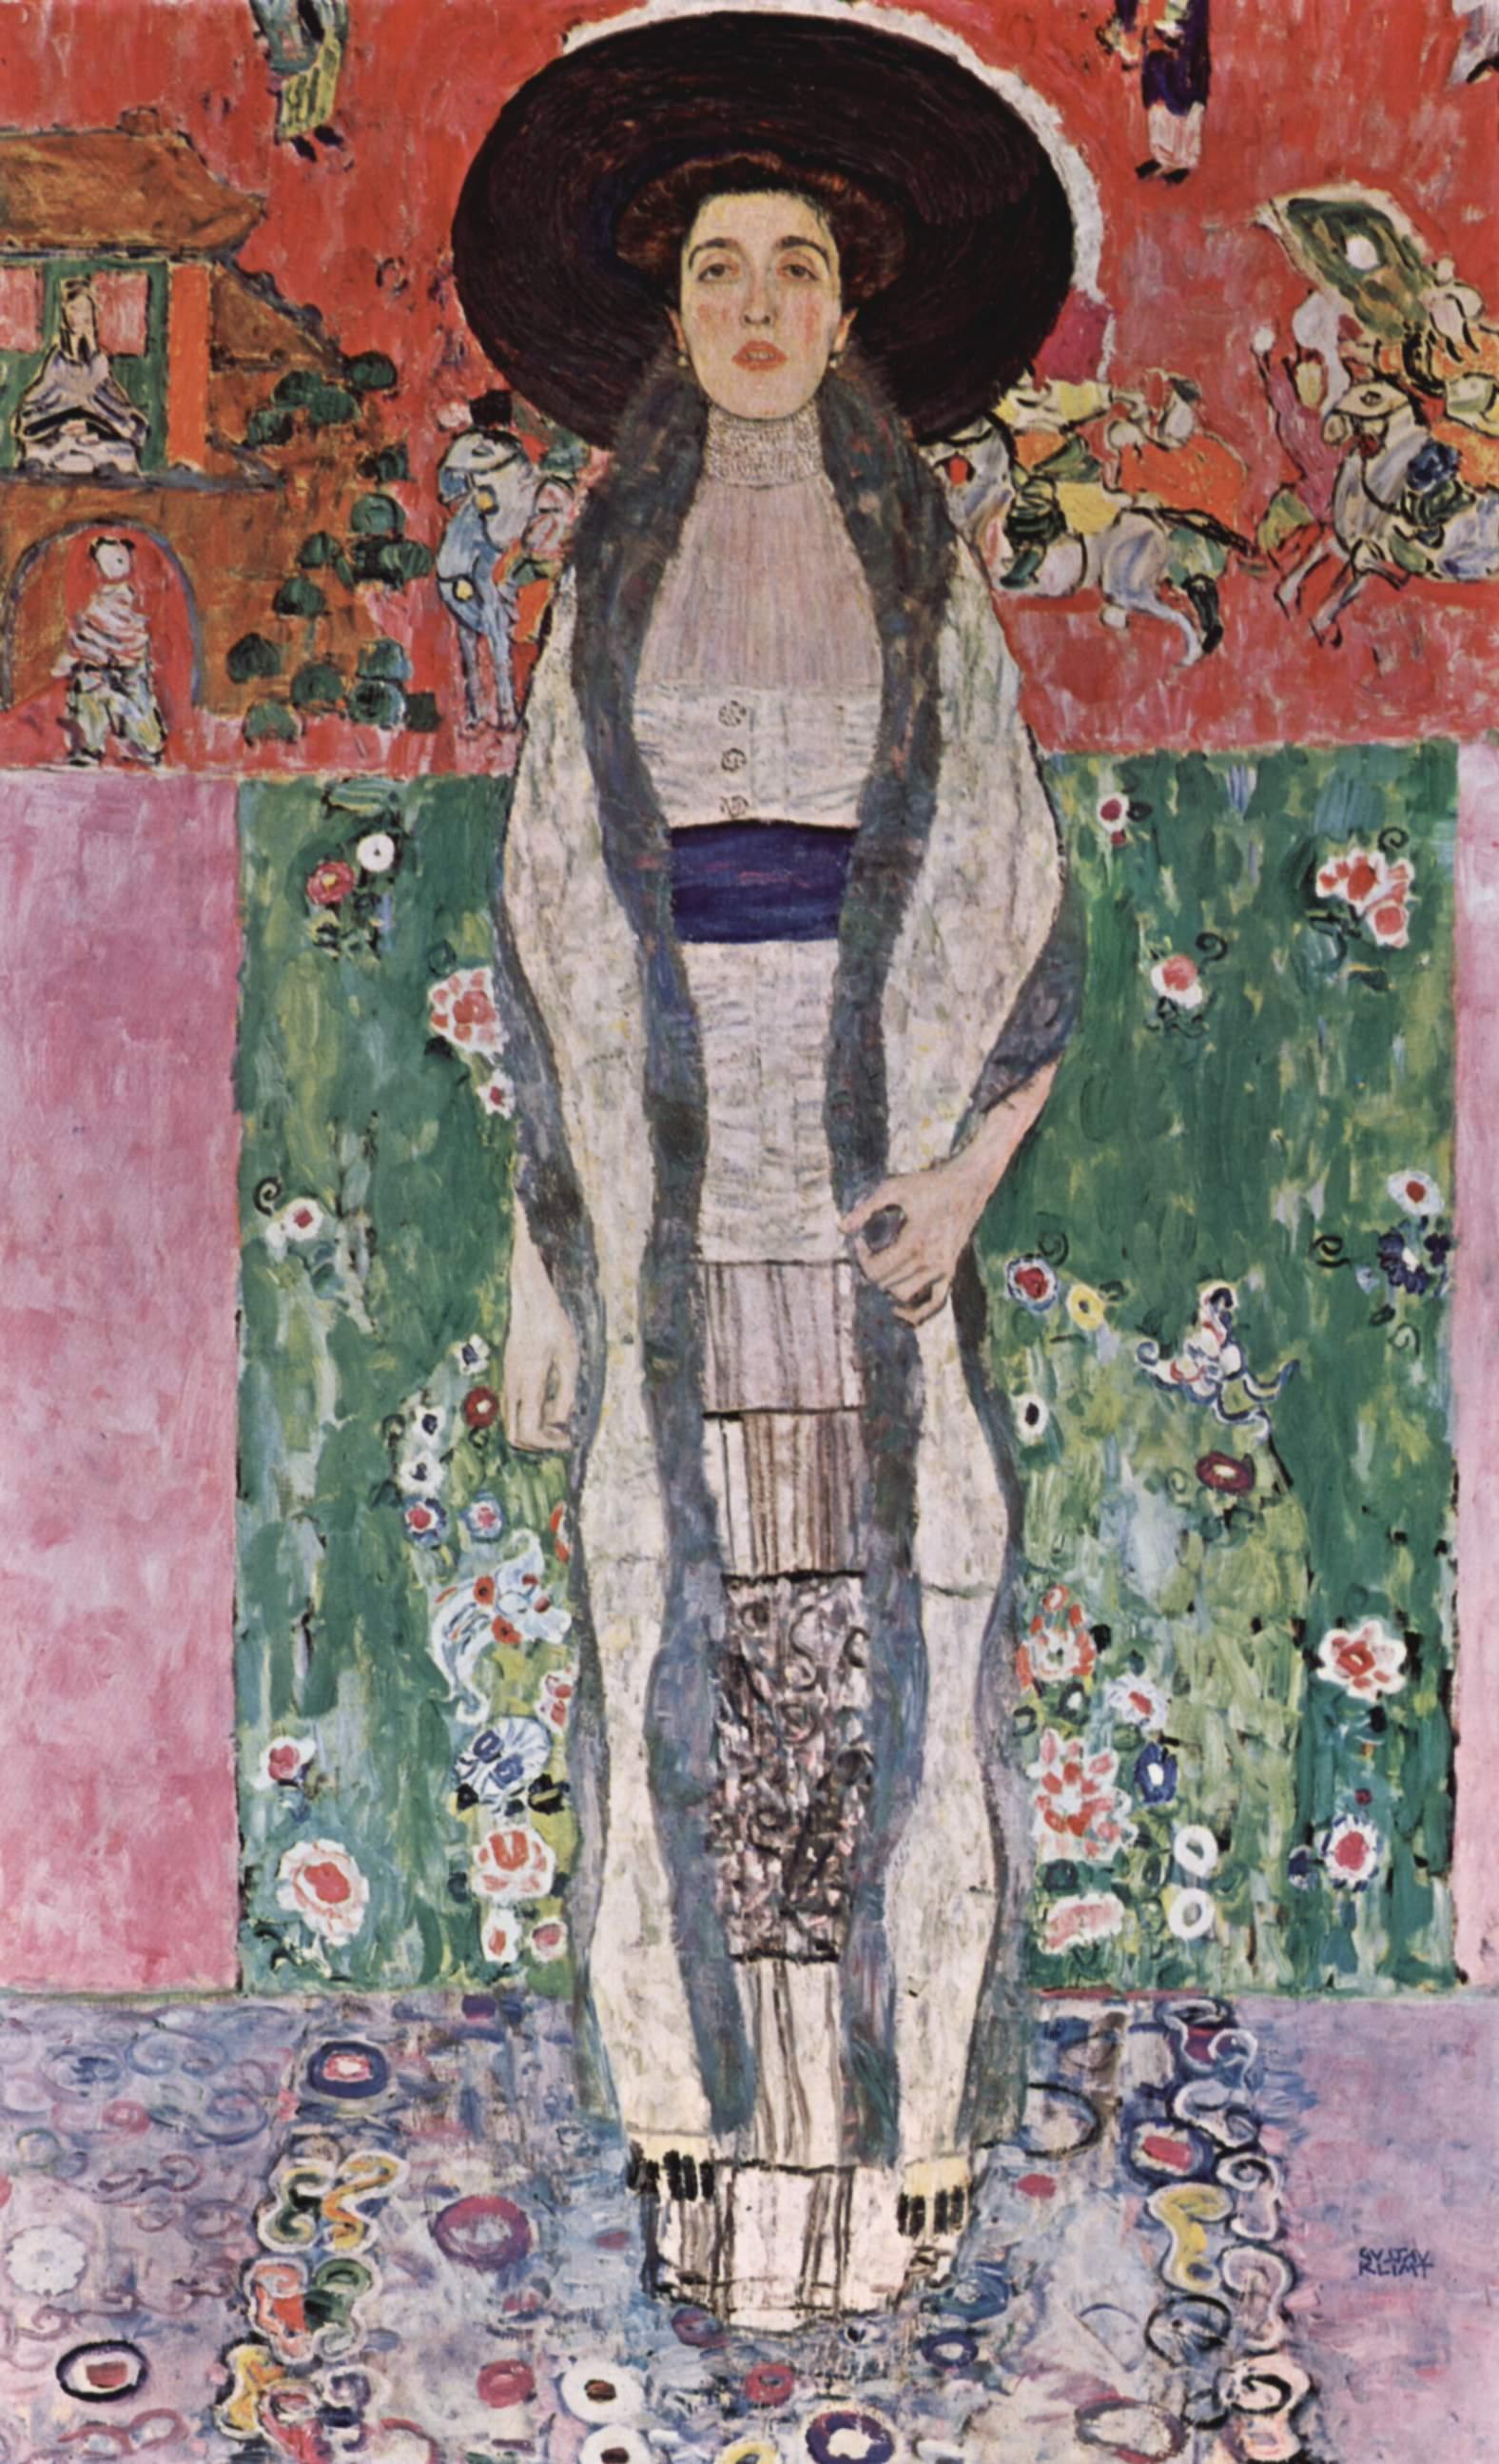 Portrait of Adele Bloch-Bauer II - Gustav Klimt - WikiArt ... Klimt Adele Bloch Bauer Ii